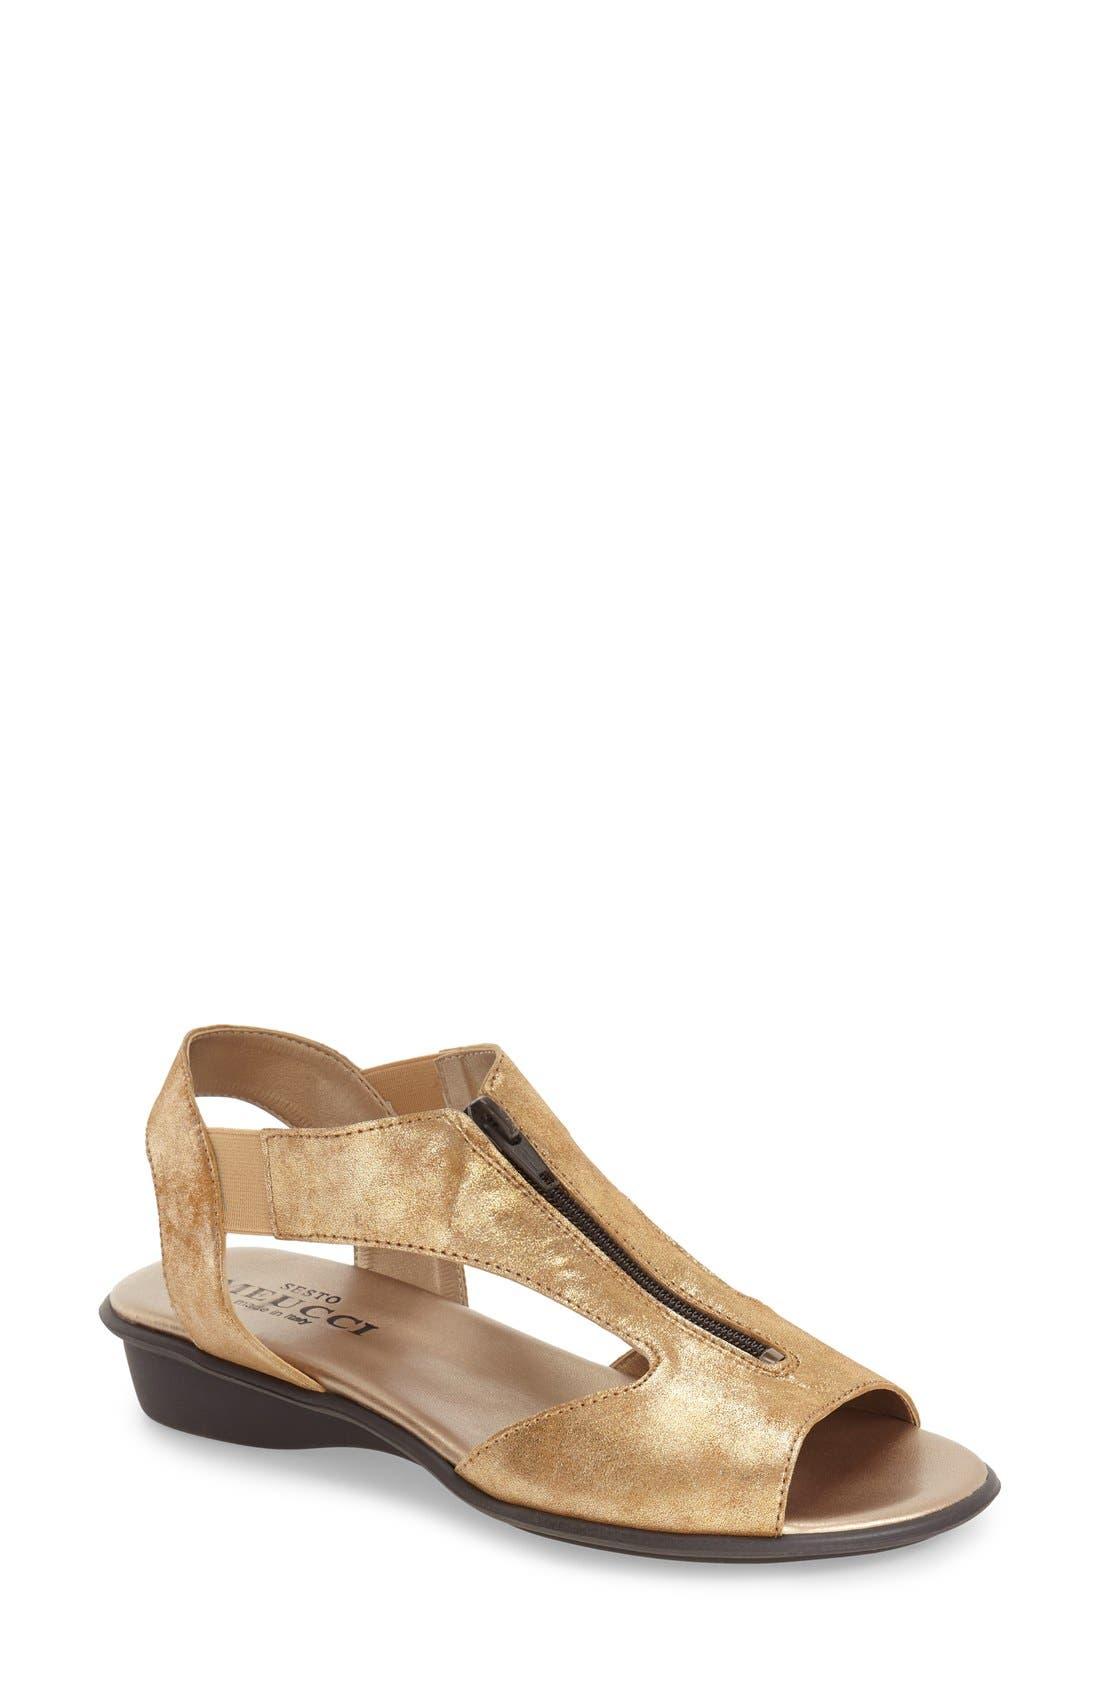 Alternate Image 1 Selected - Sesto Meucci 'Euclid' Sandal (Women)